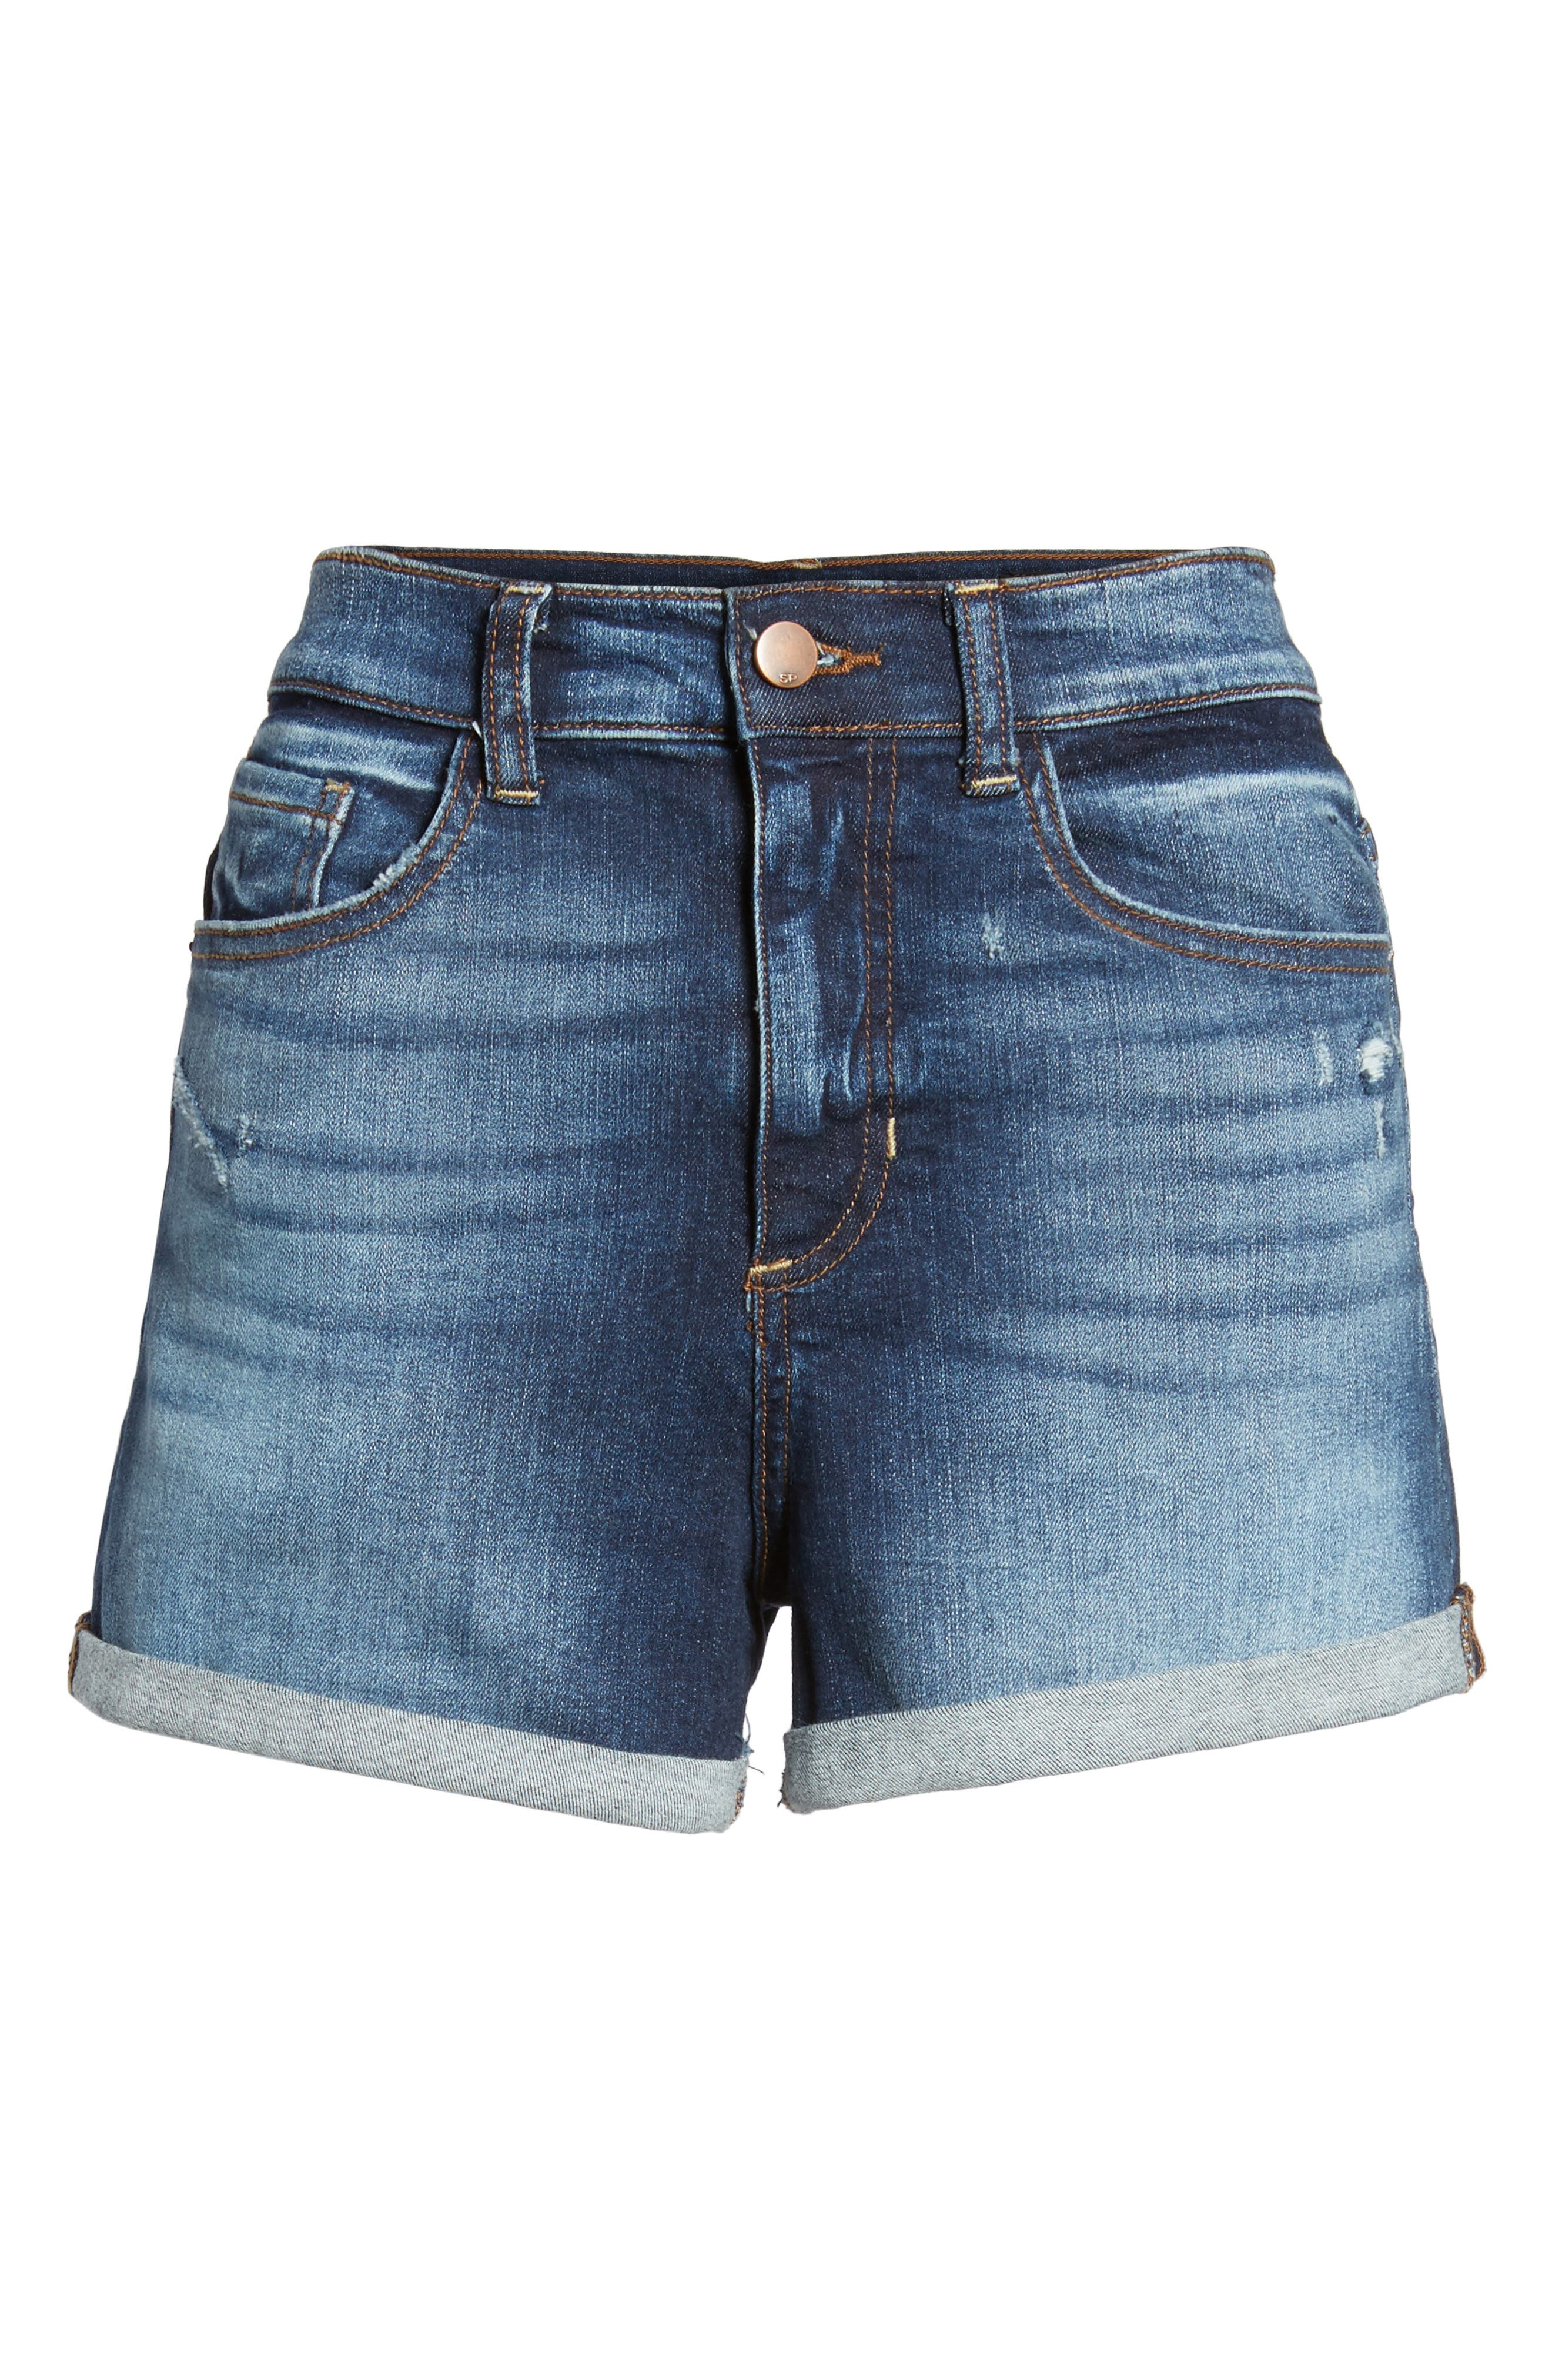 Cuffed High Waist Denim Shorts,                             Alternate thumbnail 6, color,                             401